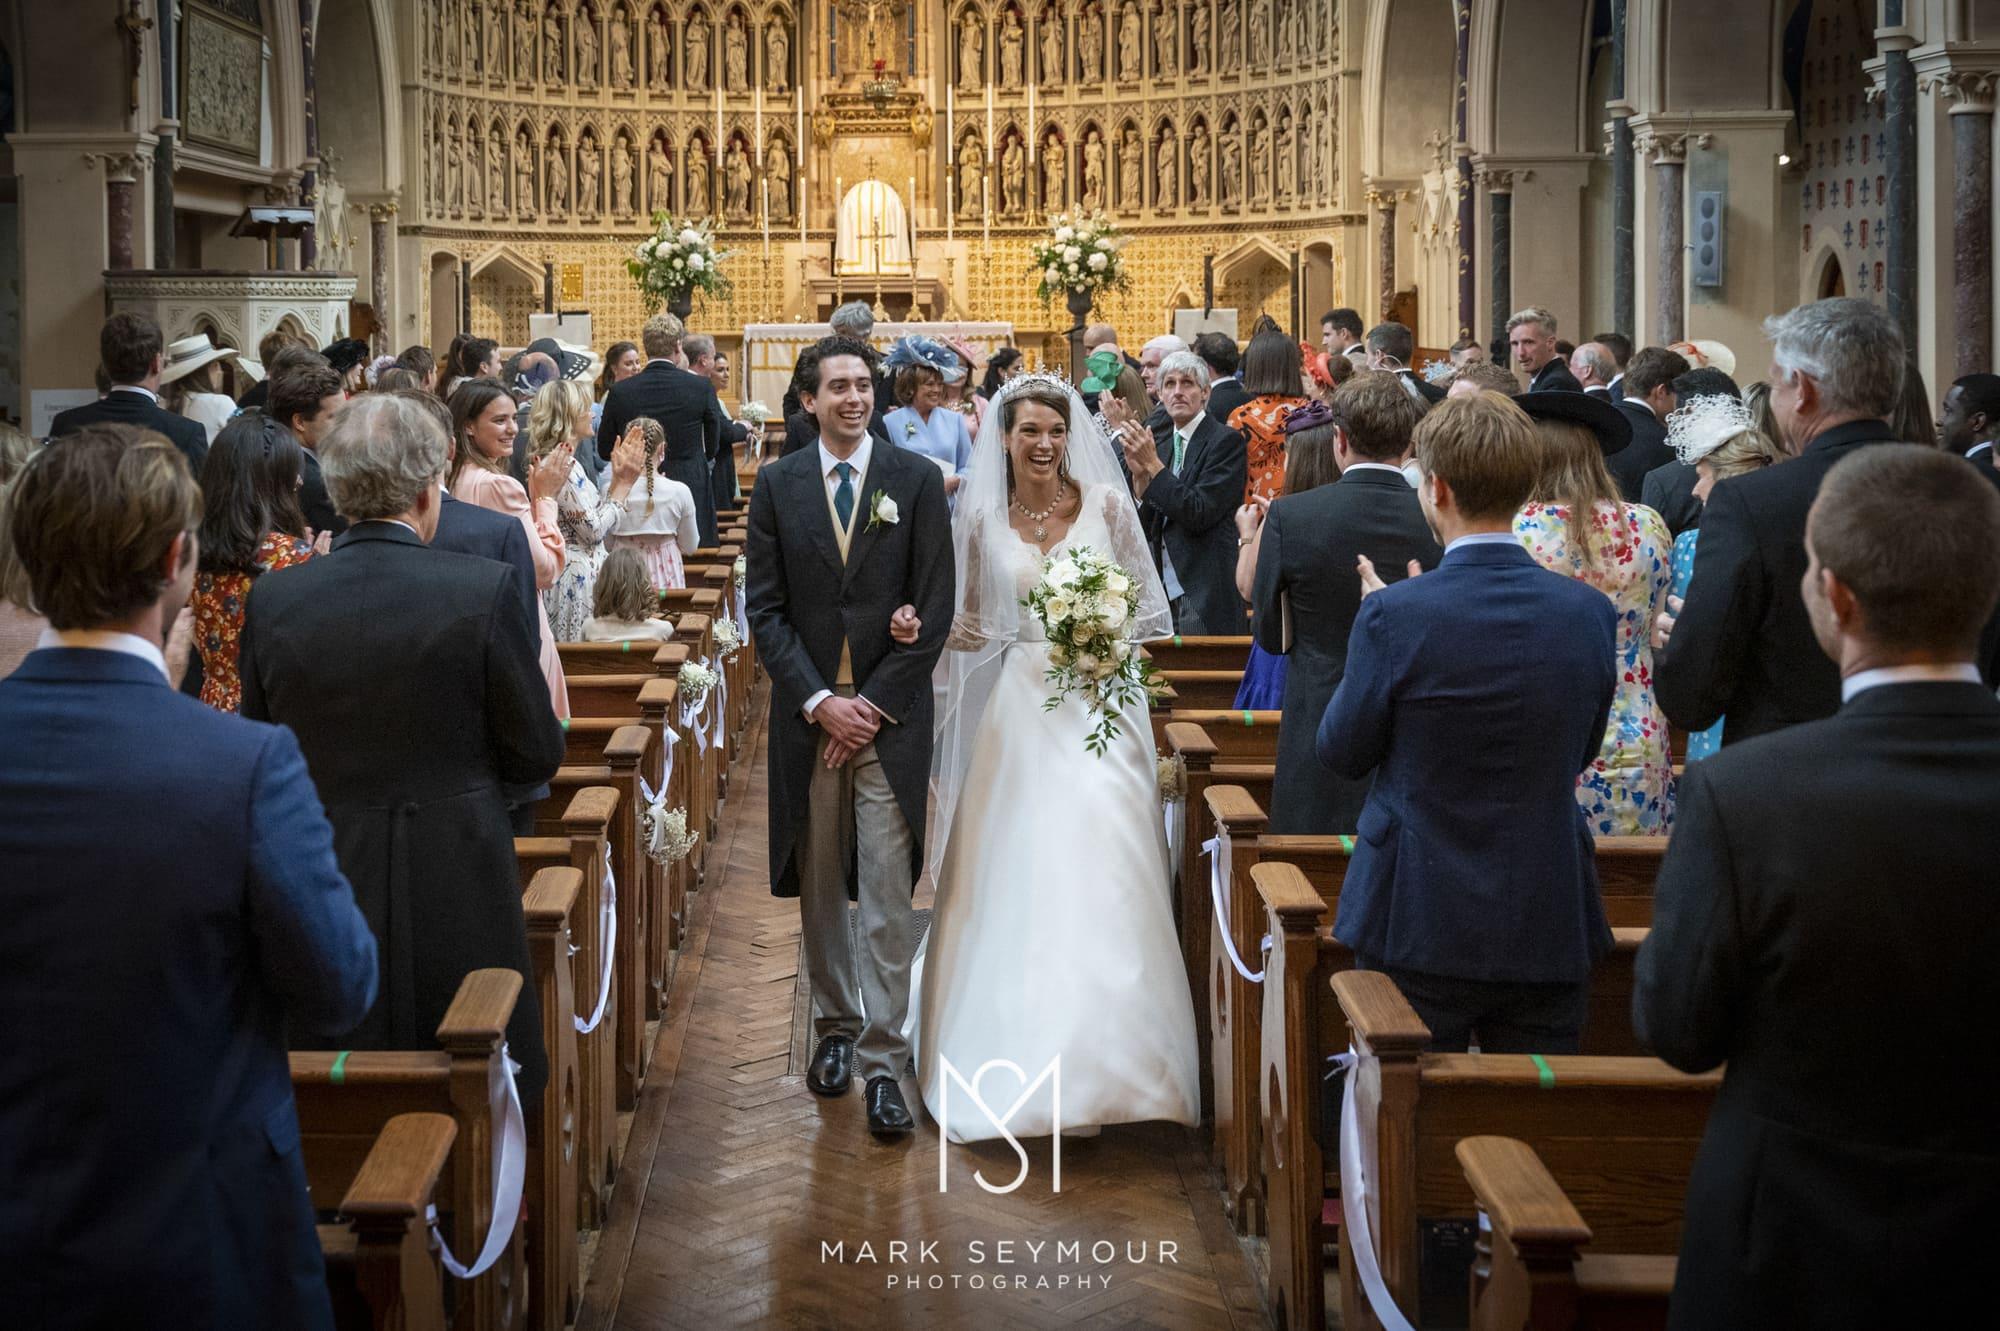 Blenheim Palace Wedding Photographer 20